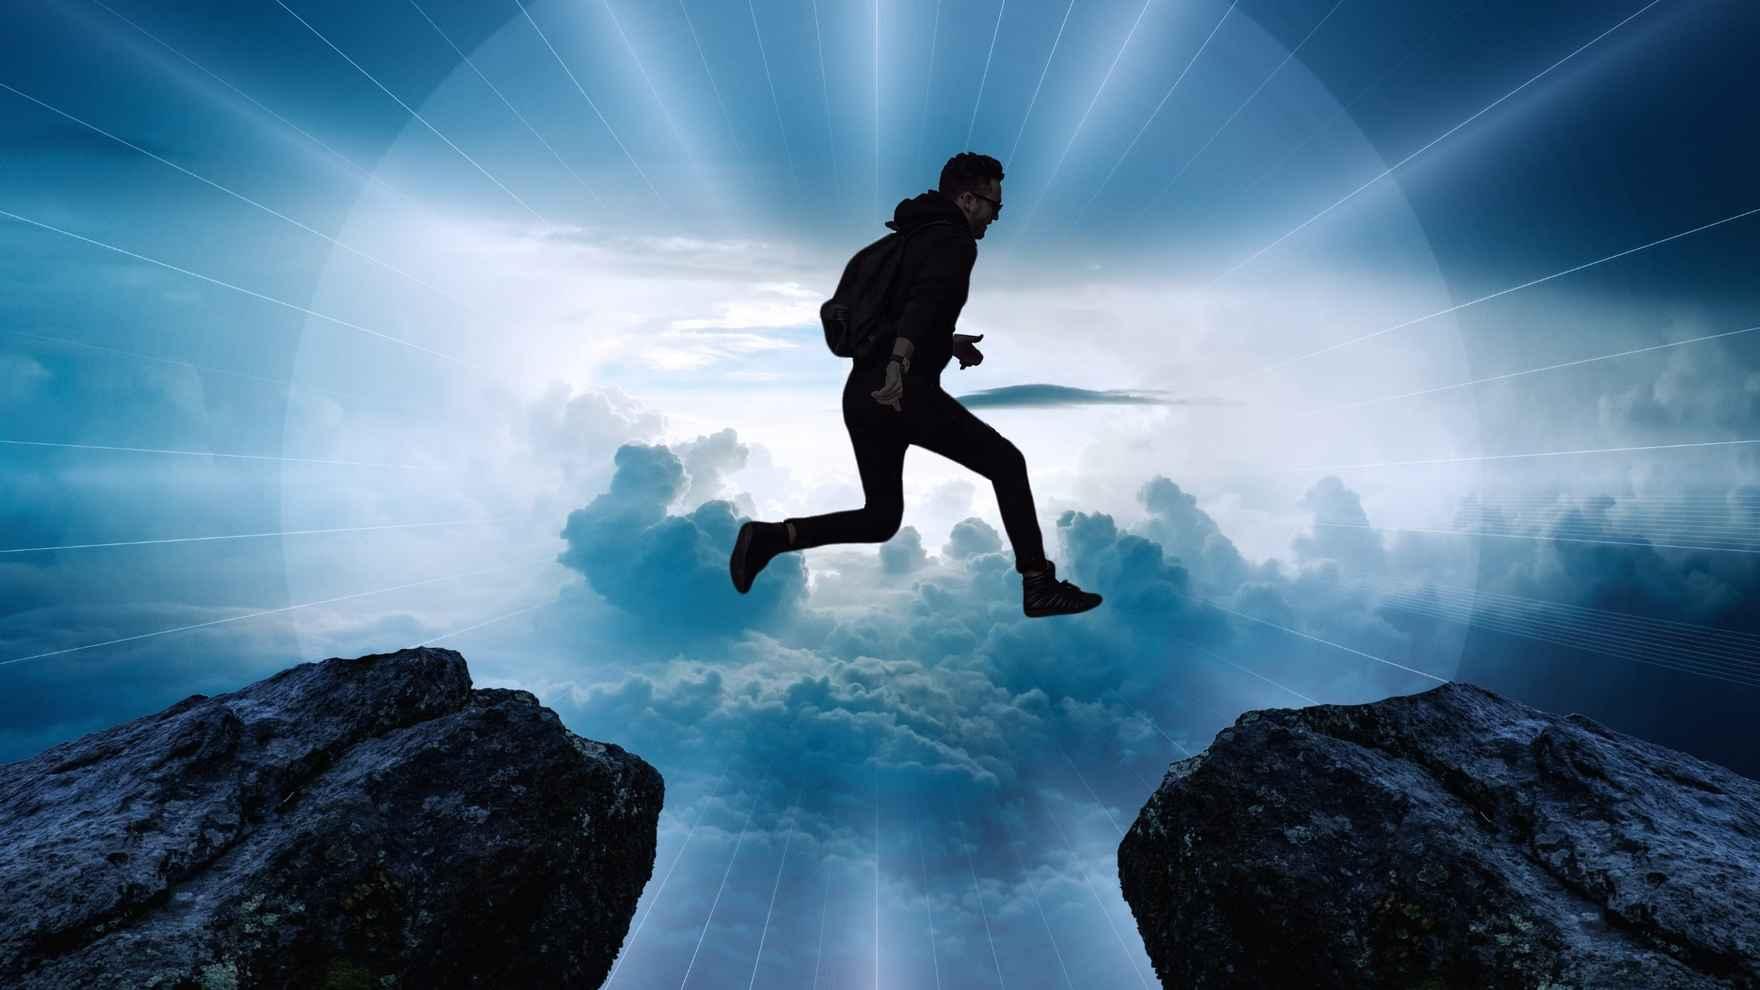 leap faith heros journey rock jump man sky light epic banner